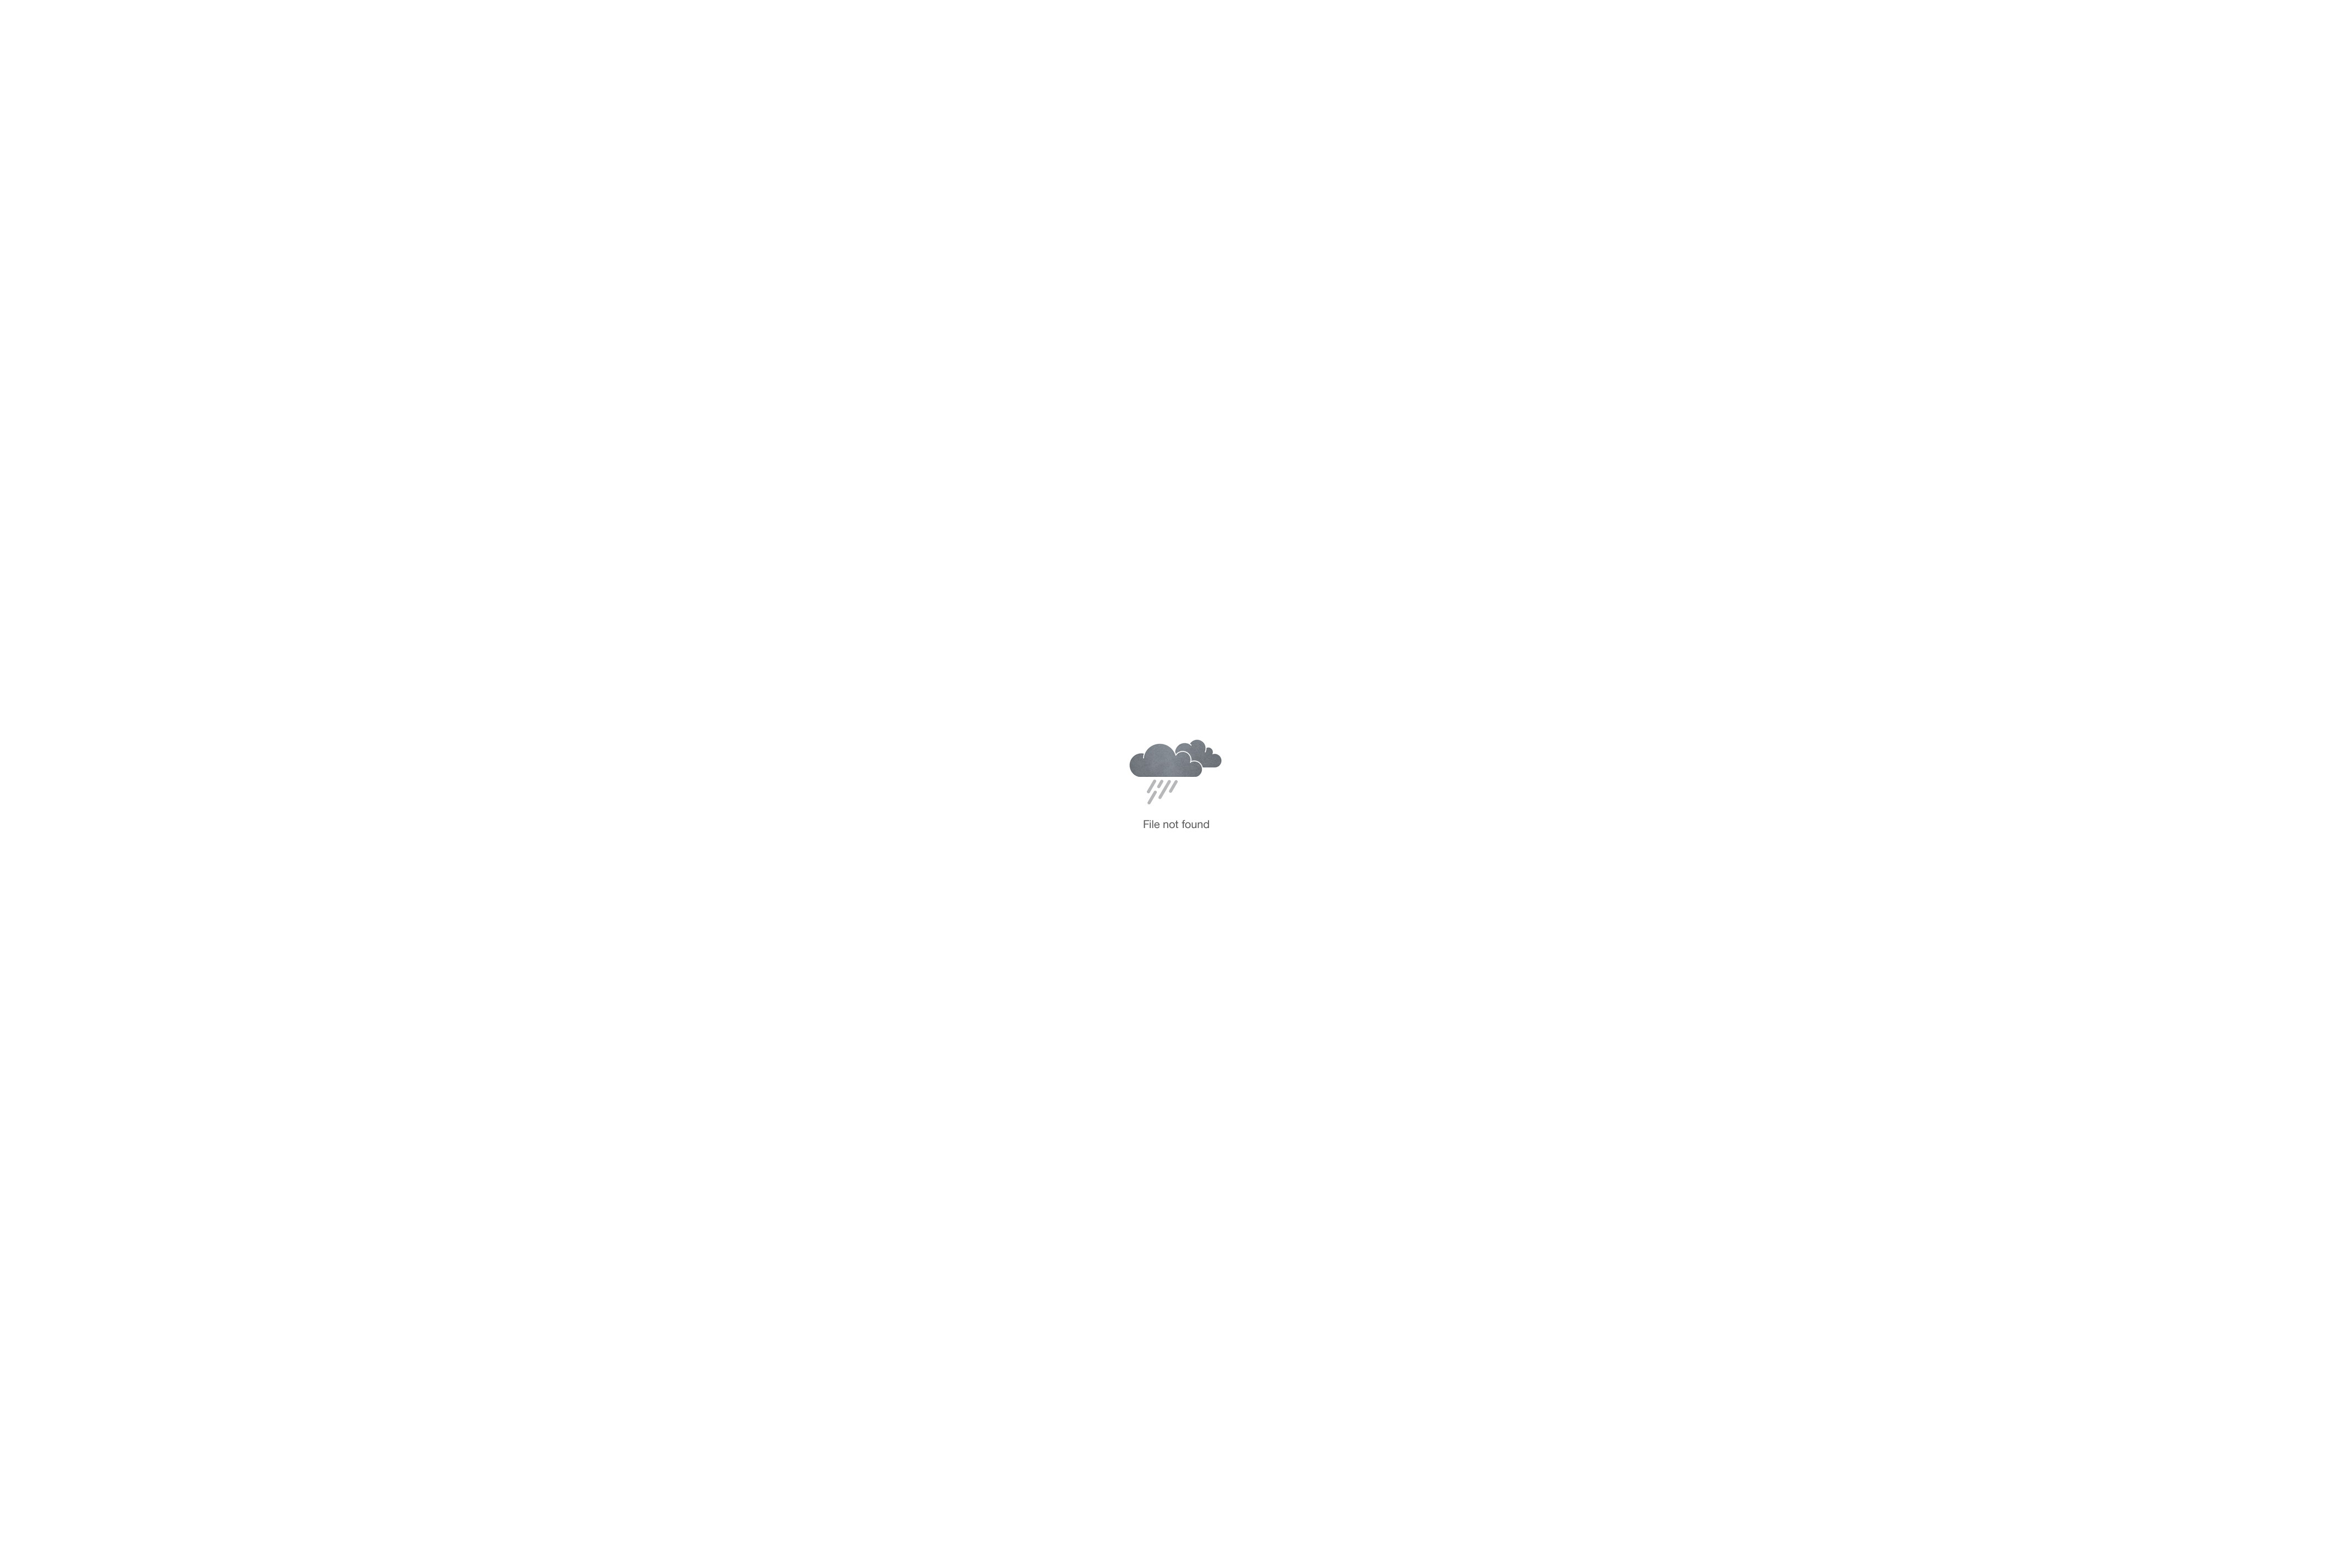 Gerald-DESCAMPS-Rugby-Sponsorise-me-image-4